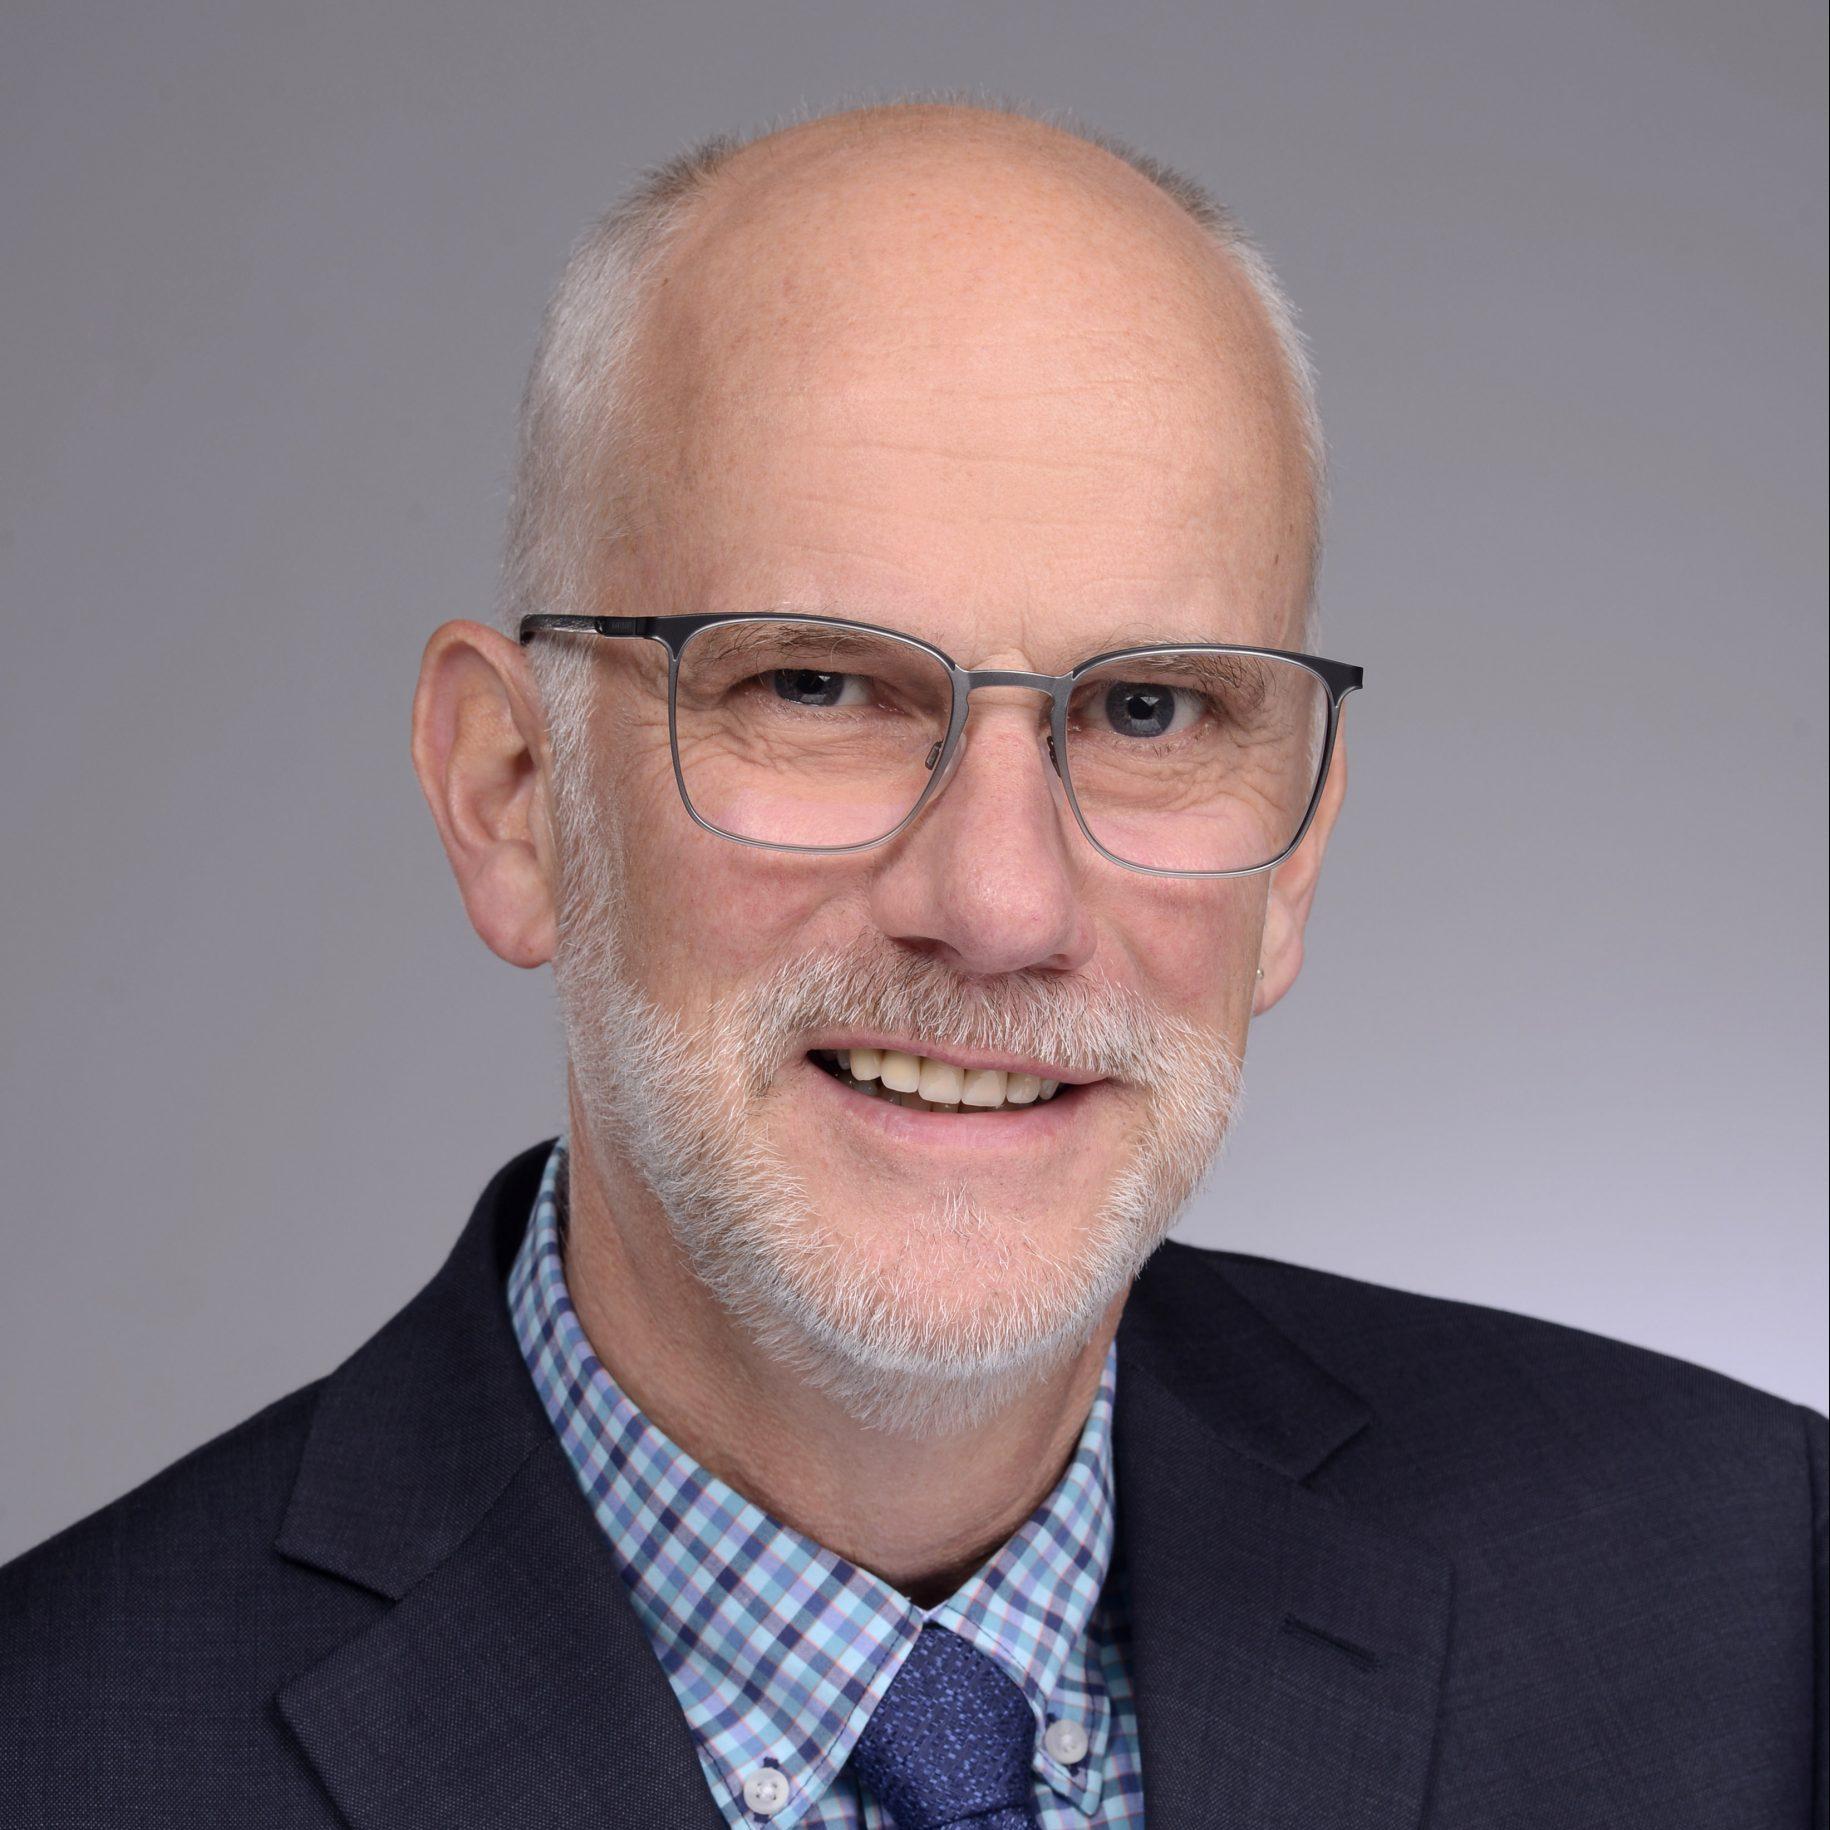 Peter Stursberg